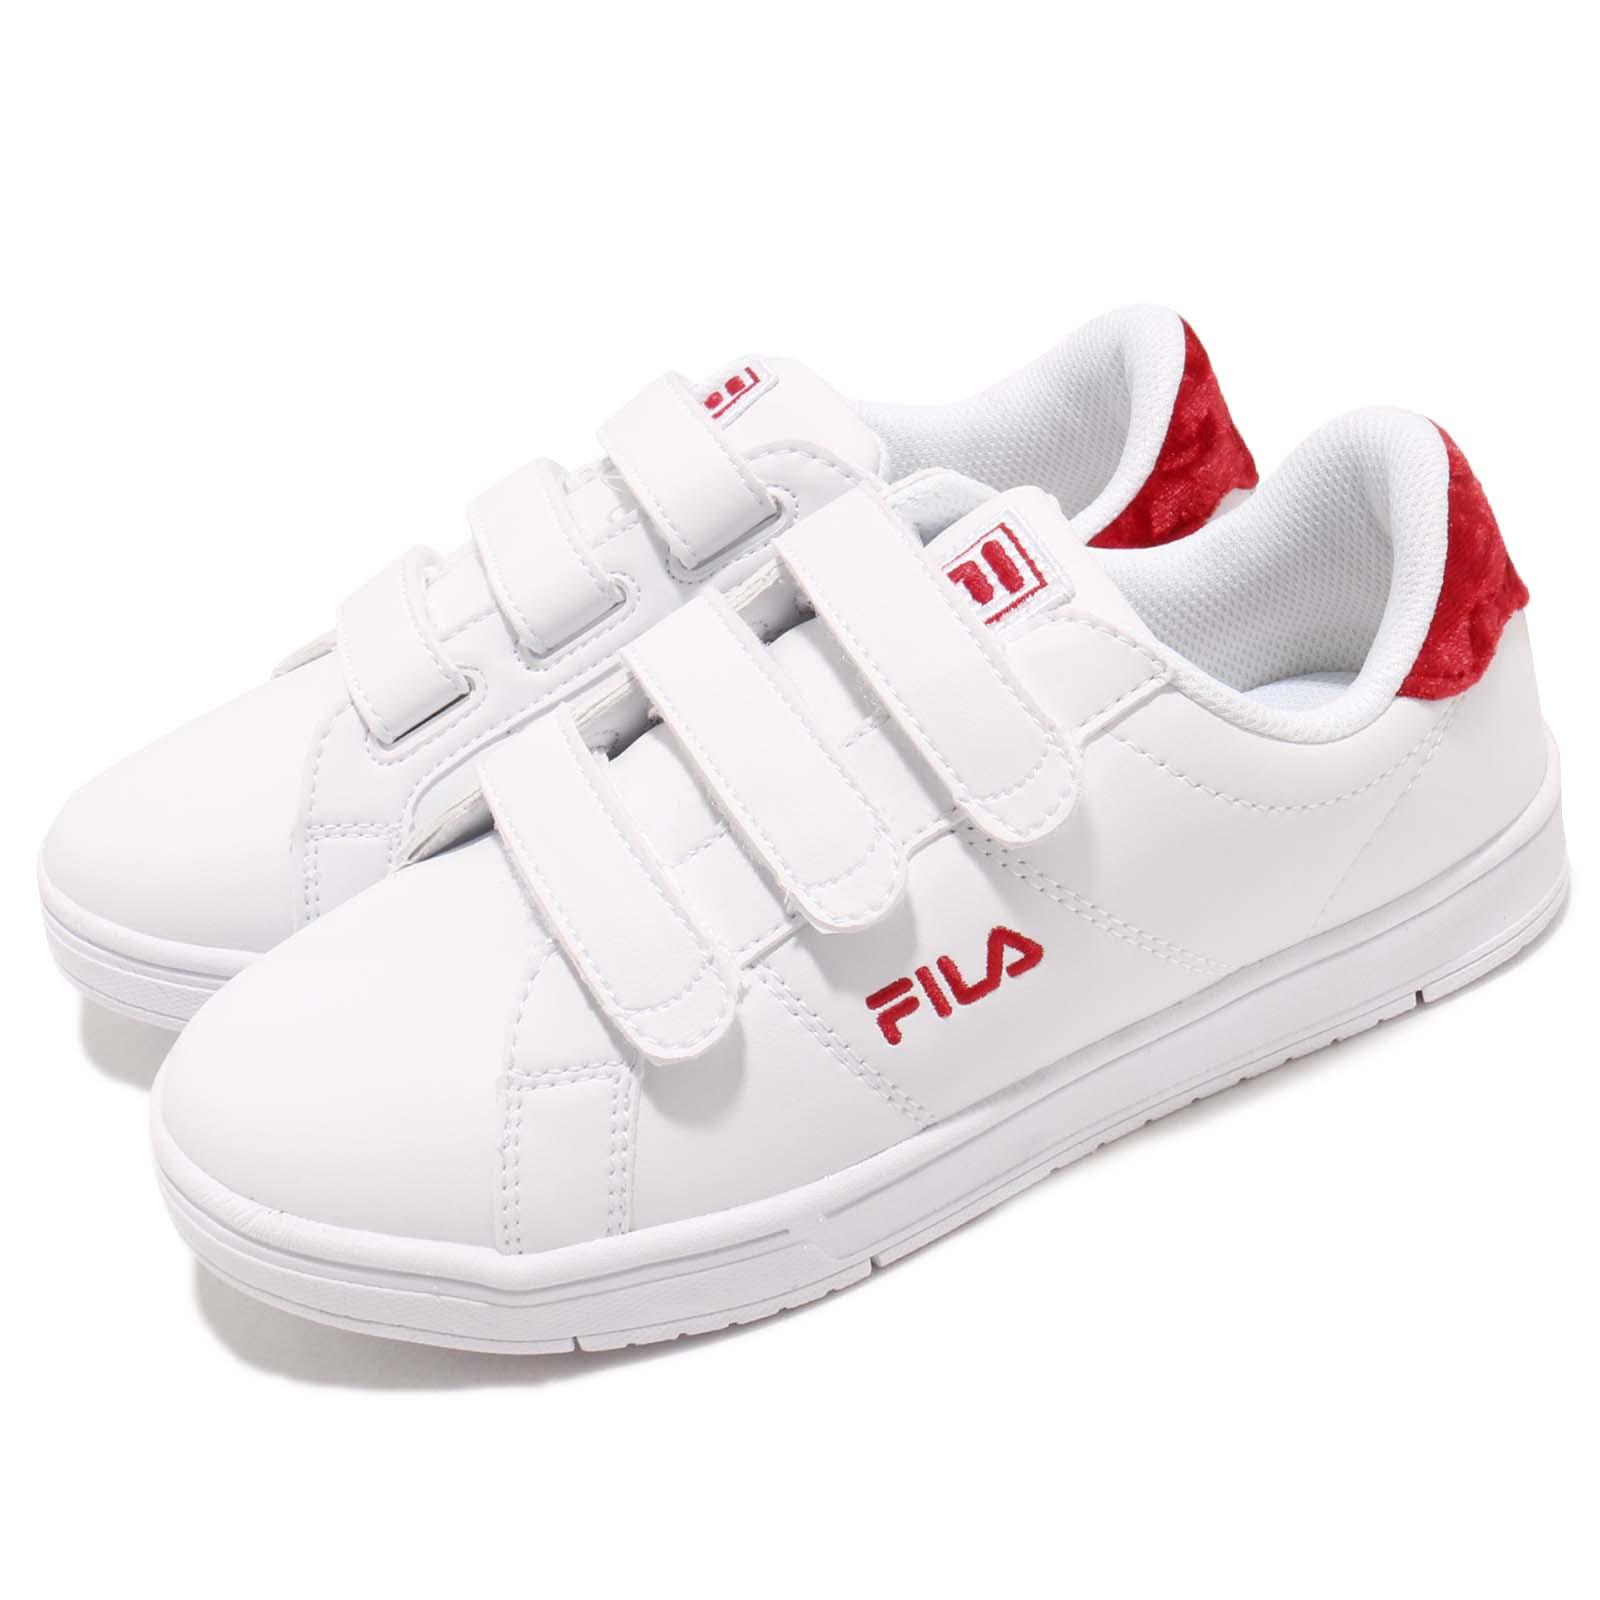 Fila 休閒鞋 COURT DELUXE C905S 女鞋 5C905S112